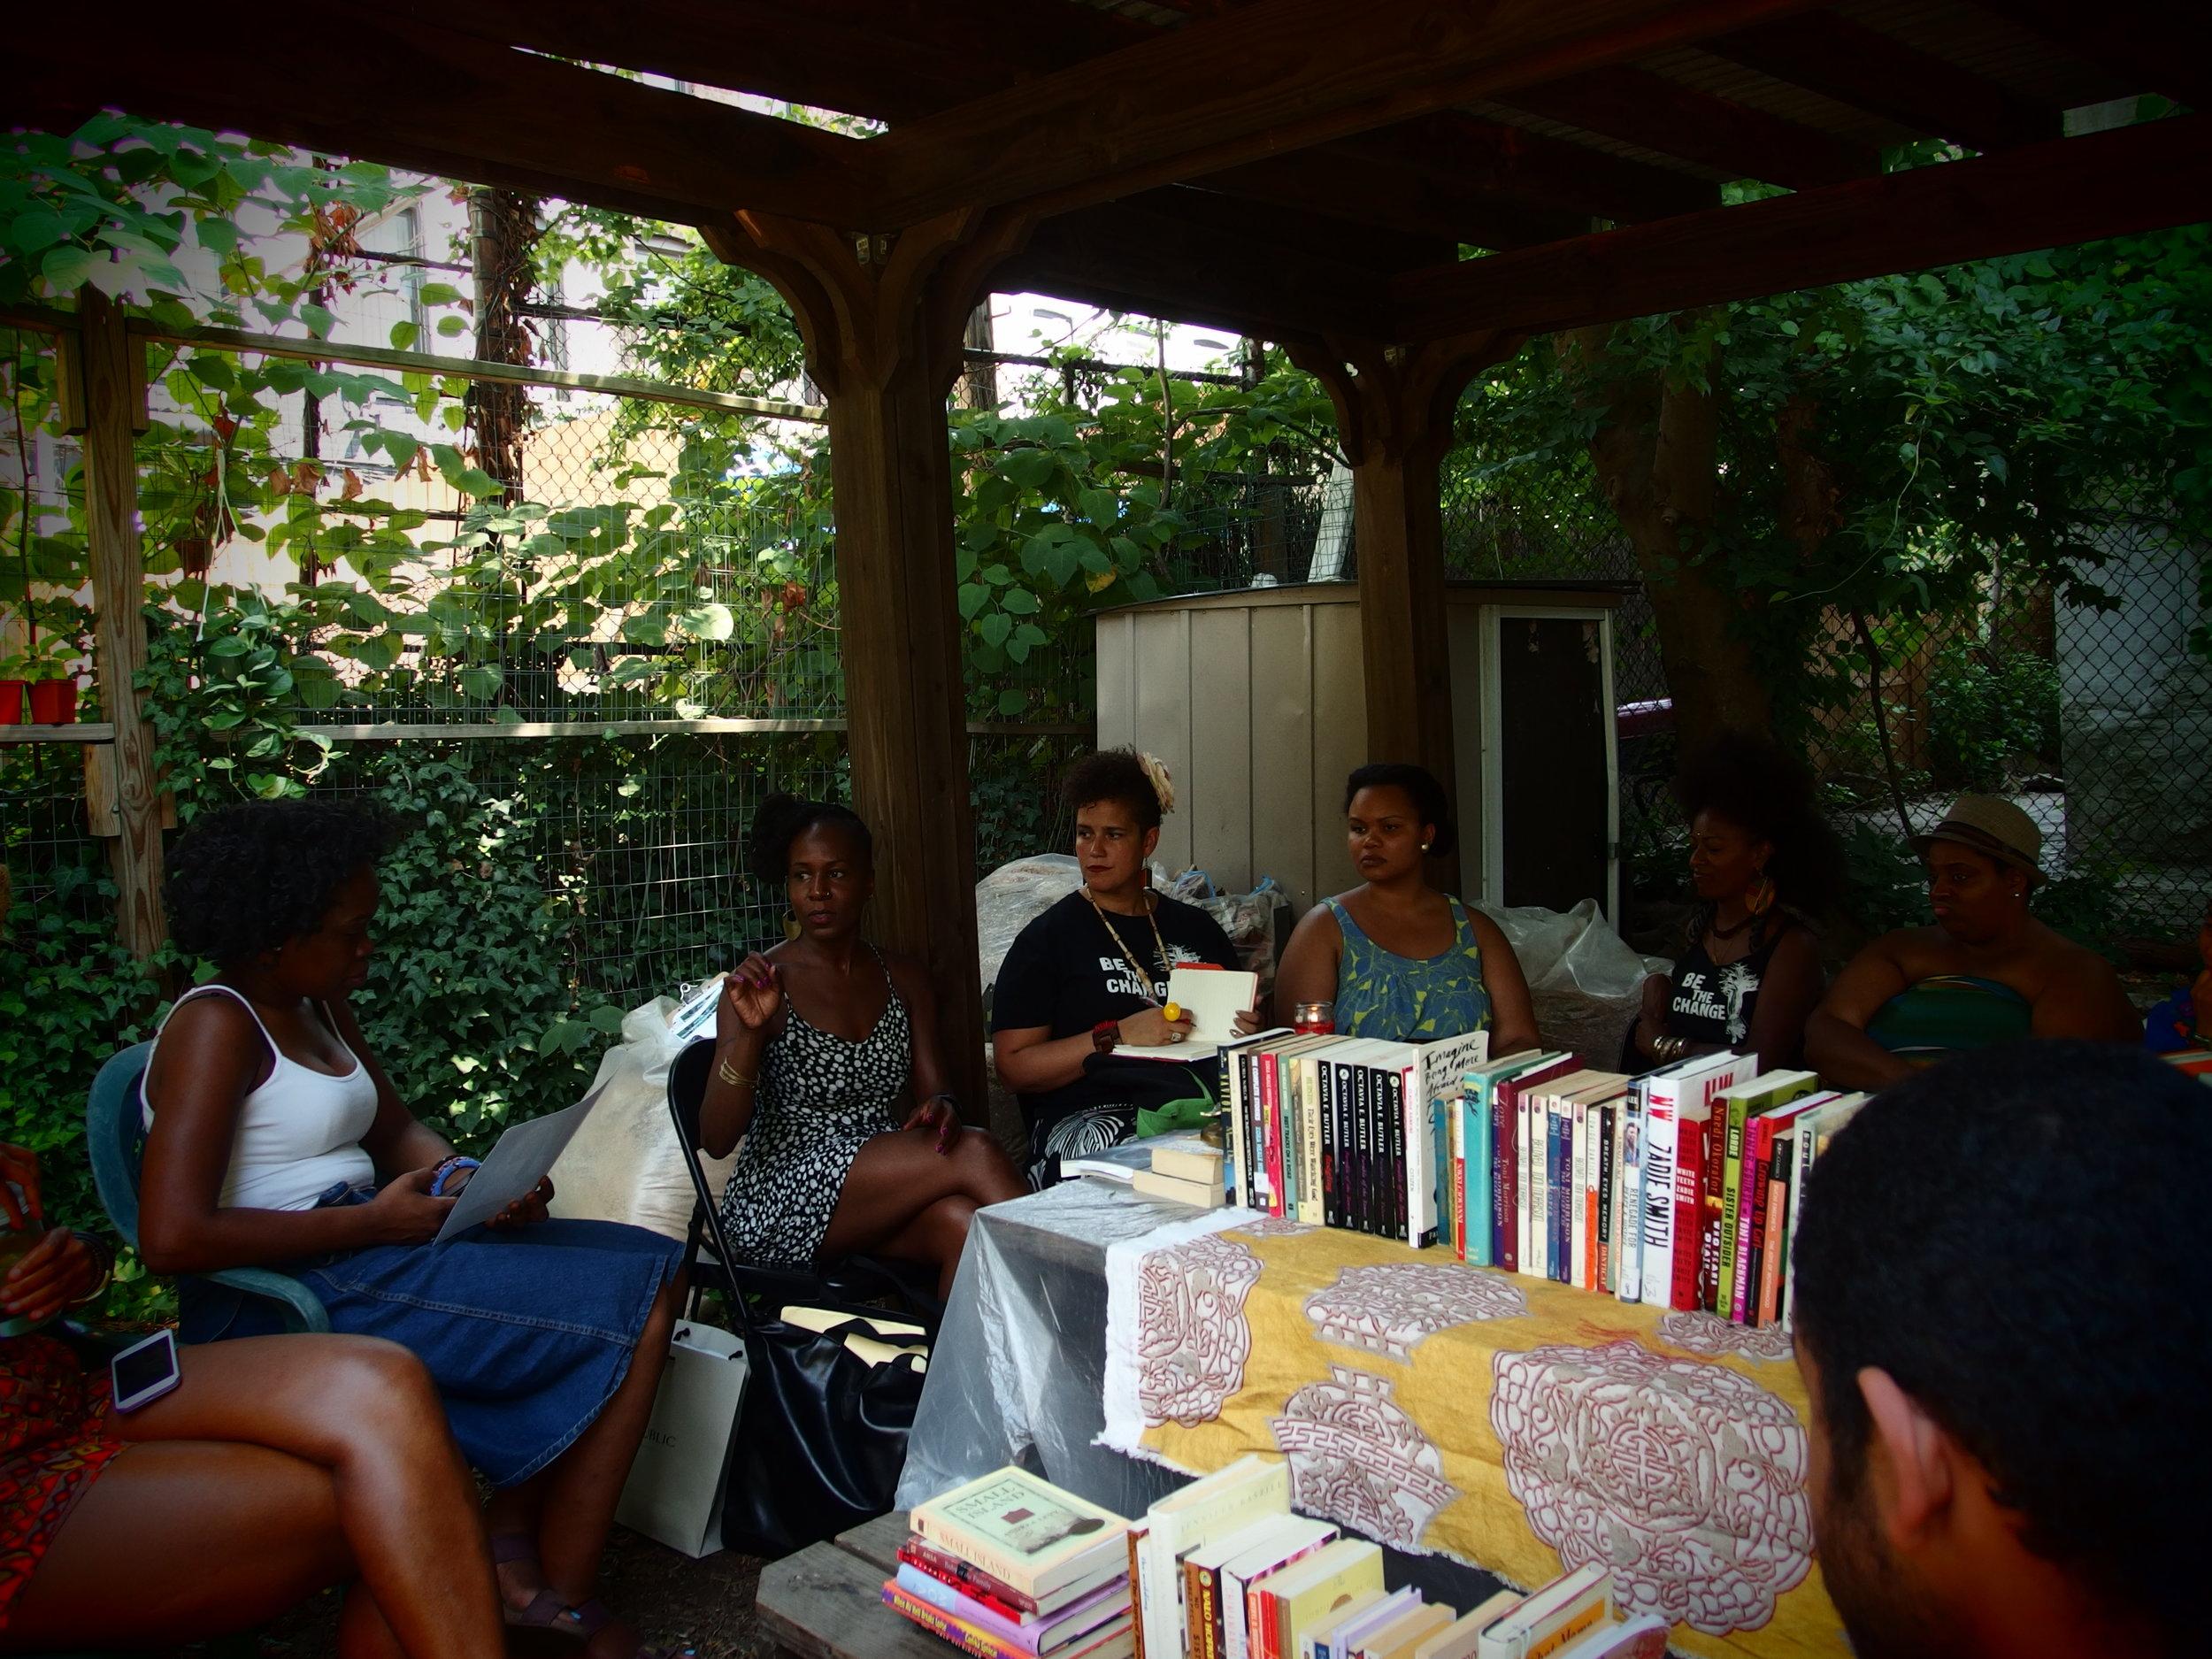 little-free-black-womens-library_20763181998_o.jpg